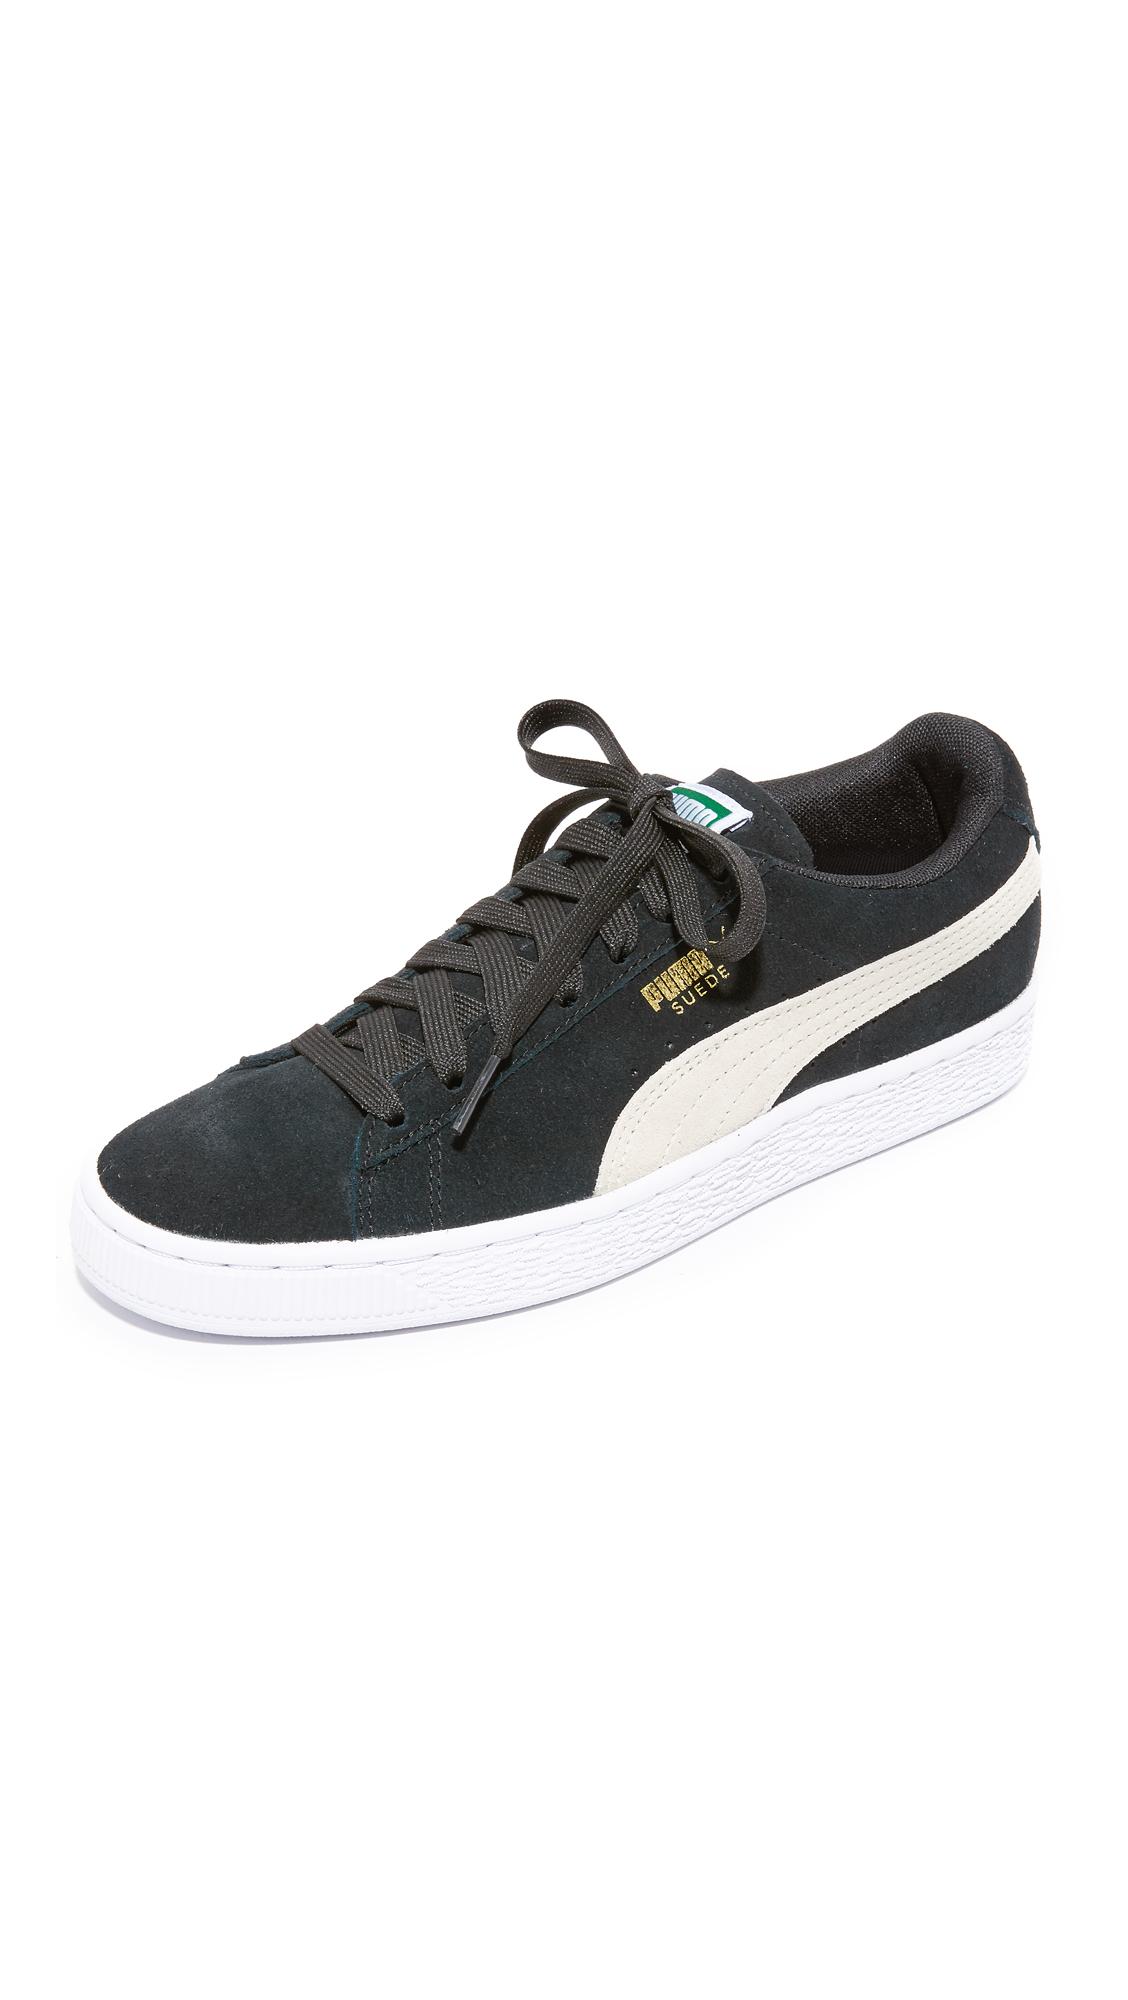 c707e7f578326f PUMA Classic Lace Up Sneakers